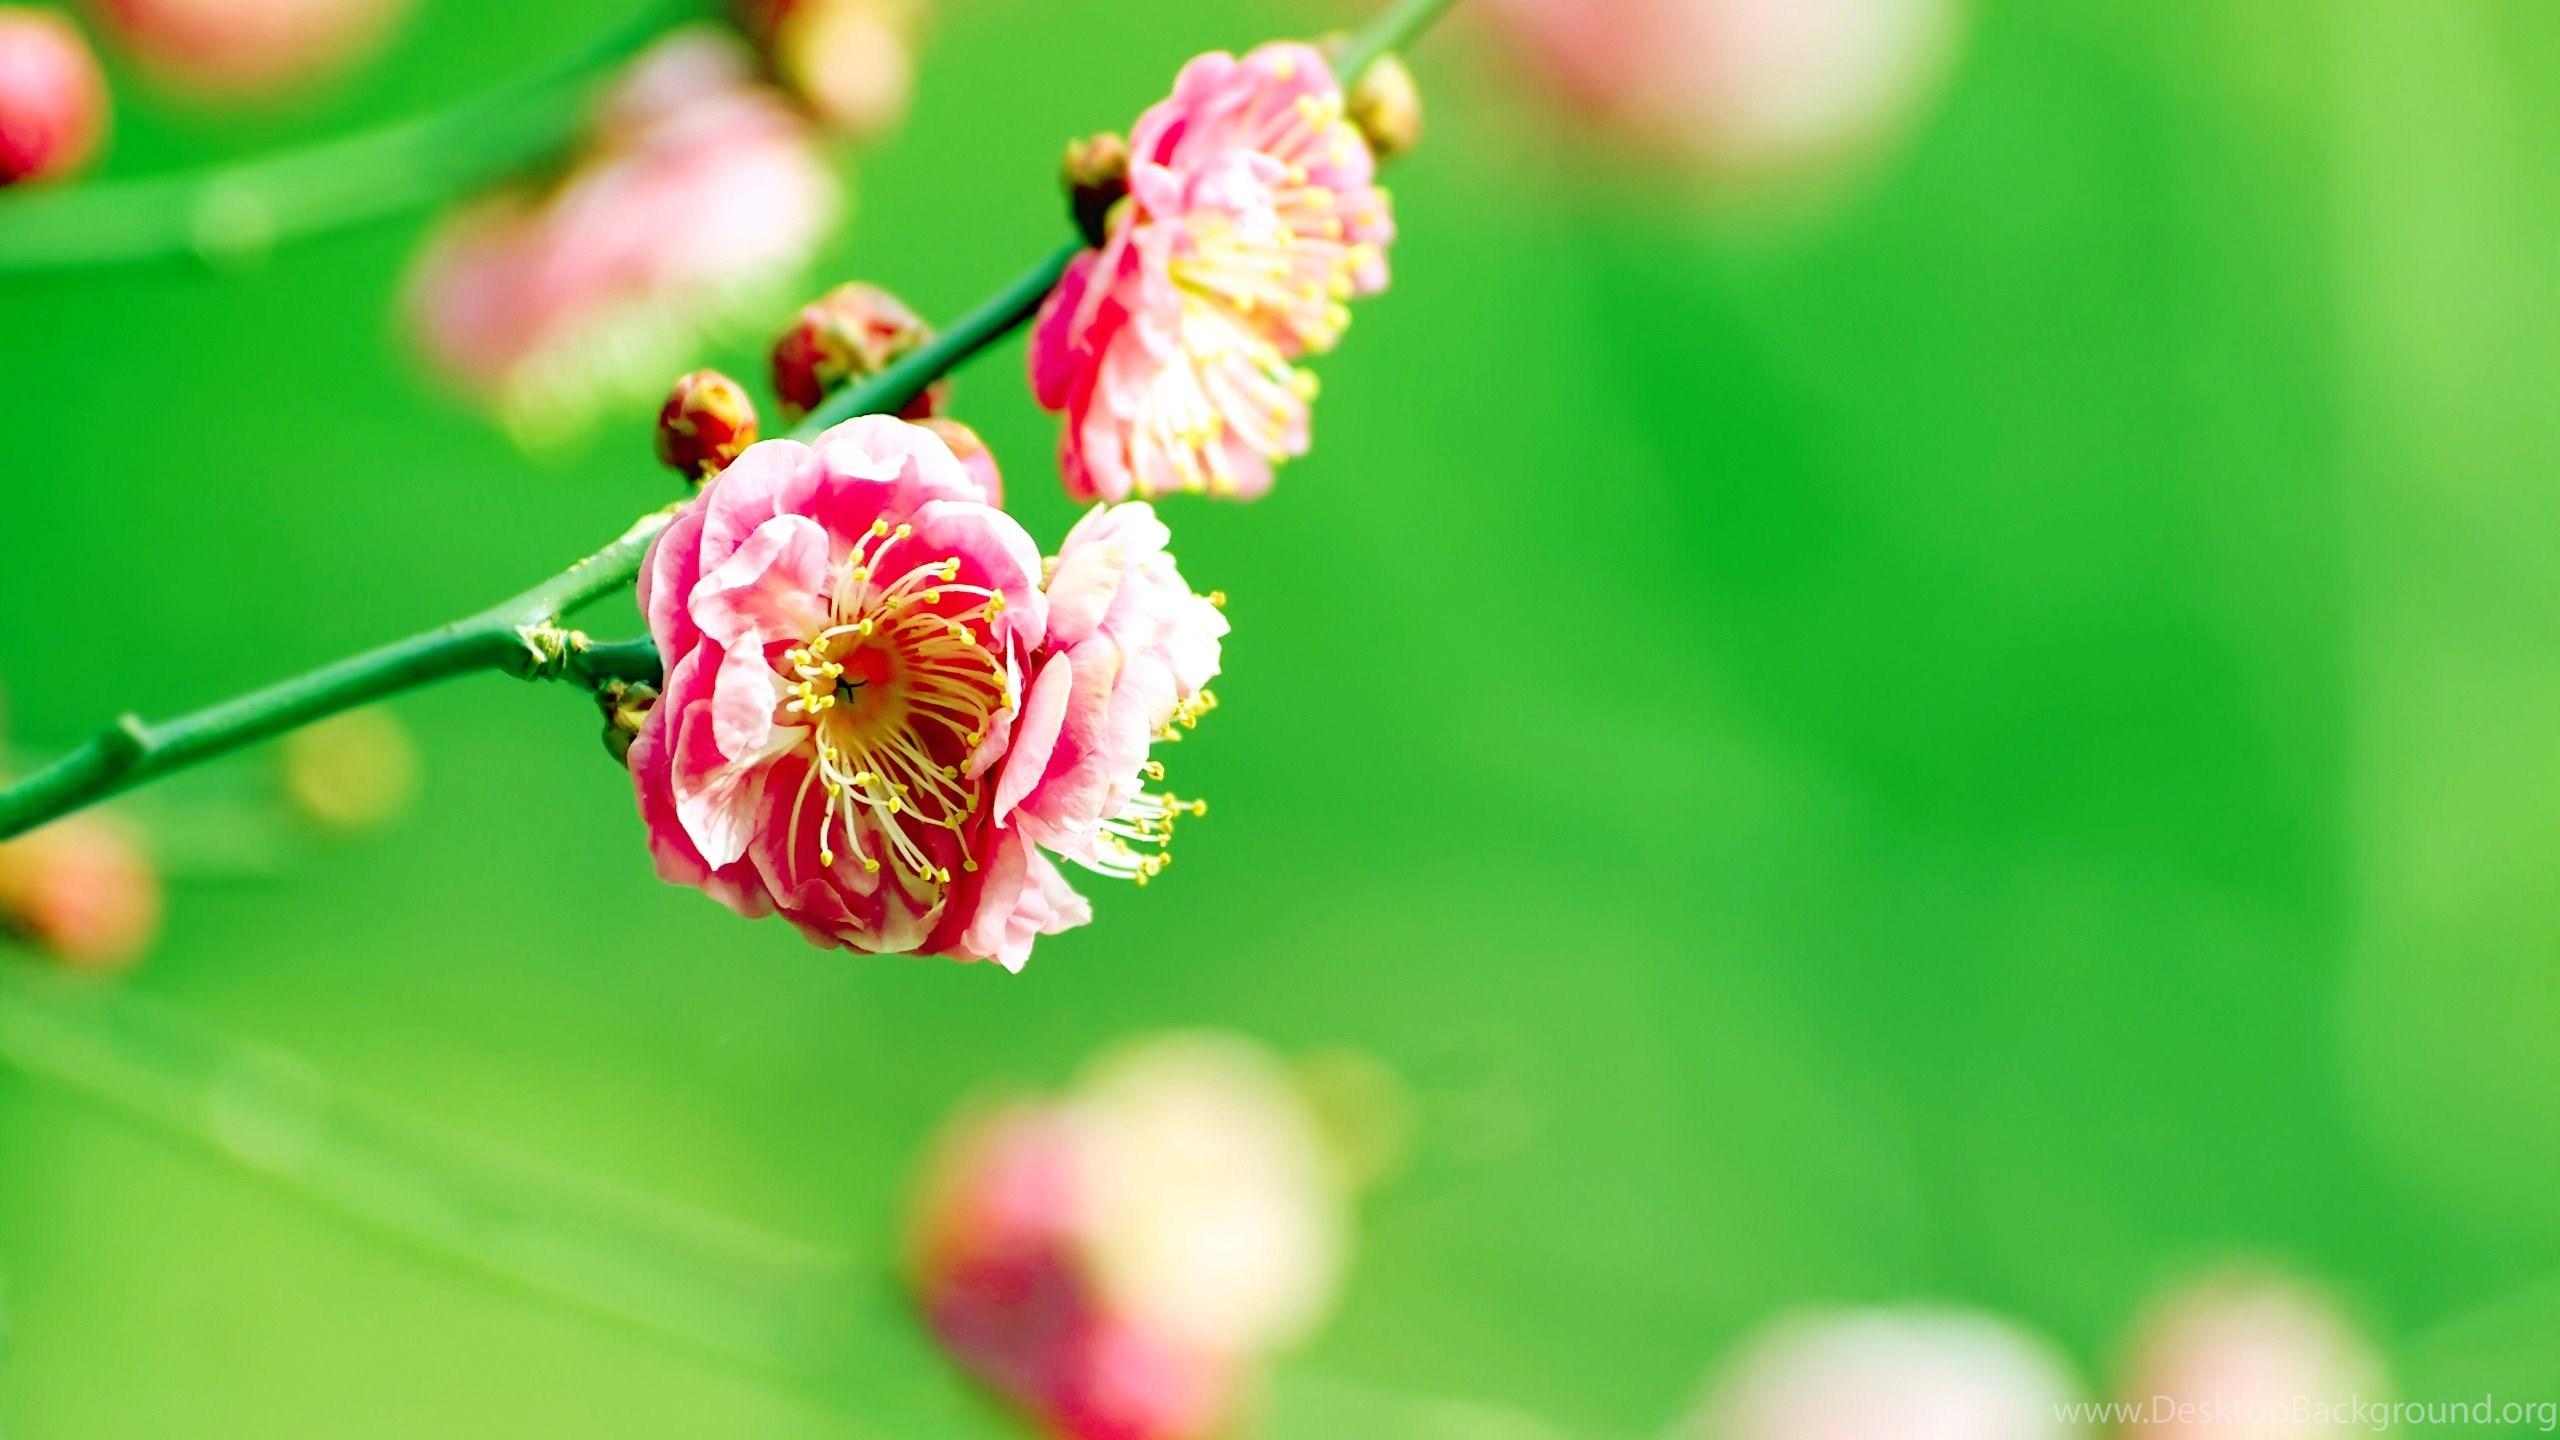 Spring flowers wallpapers desktop background netbook mightylinksfo